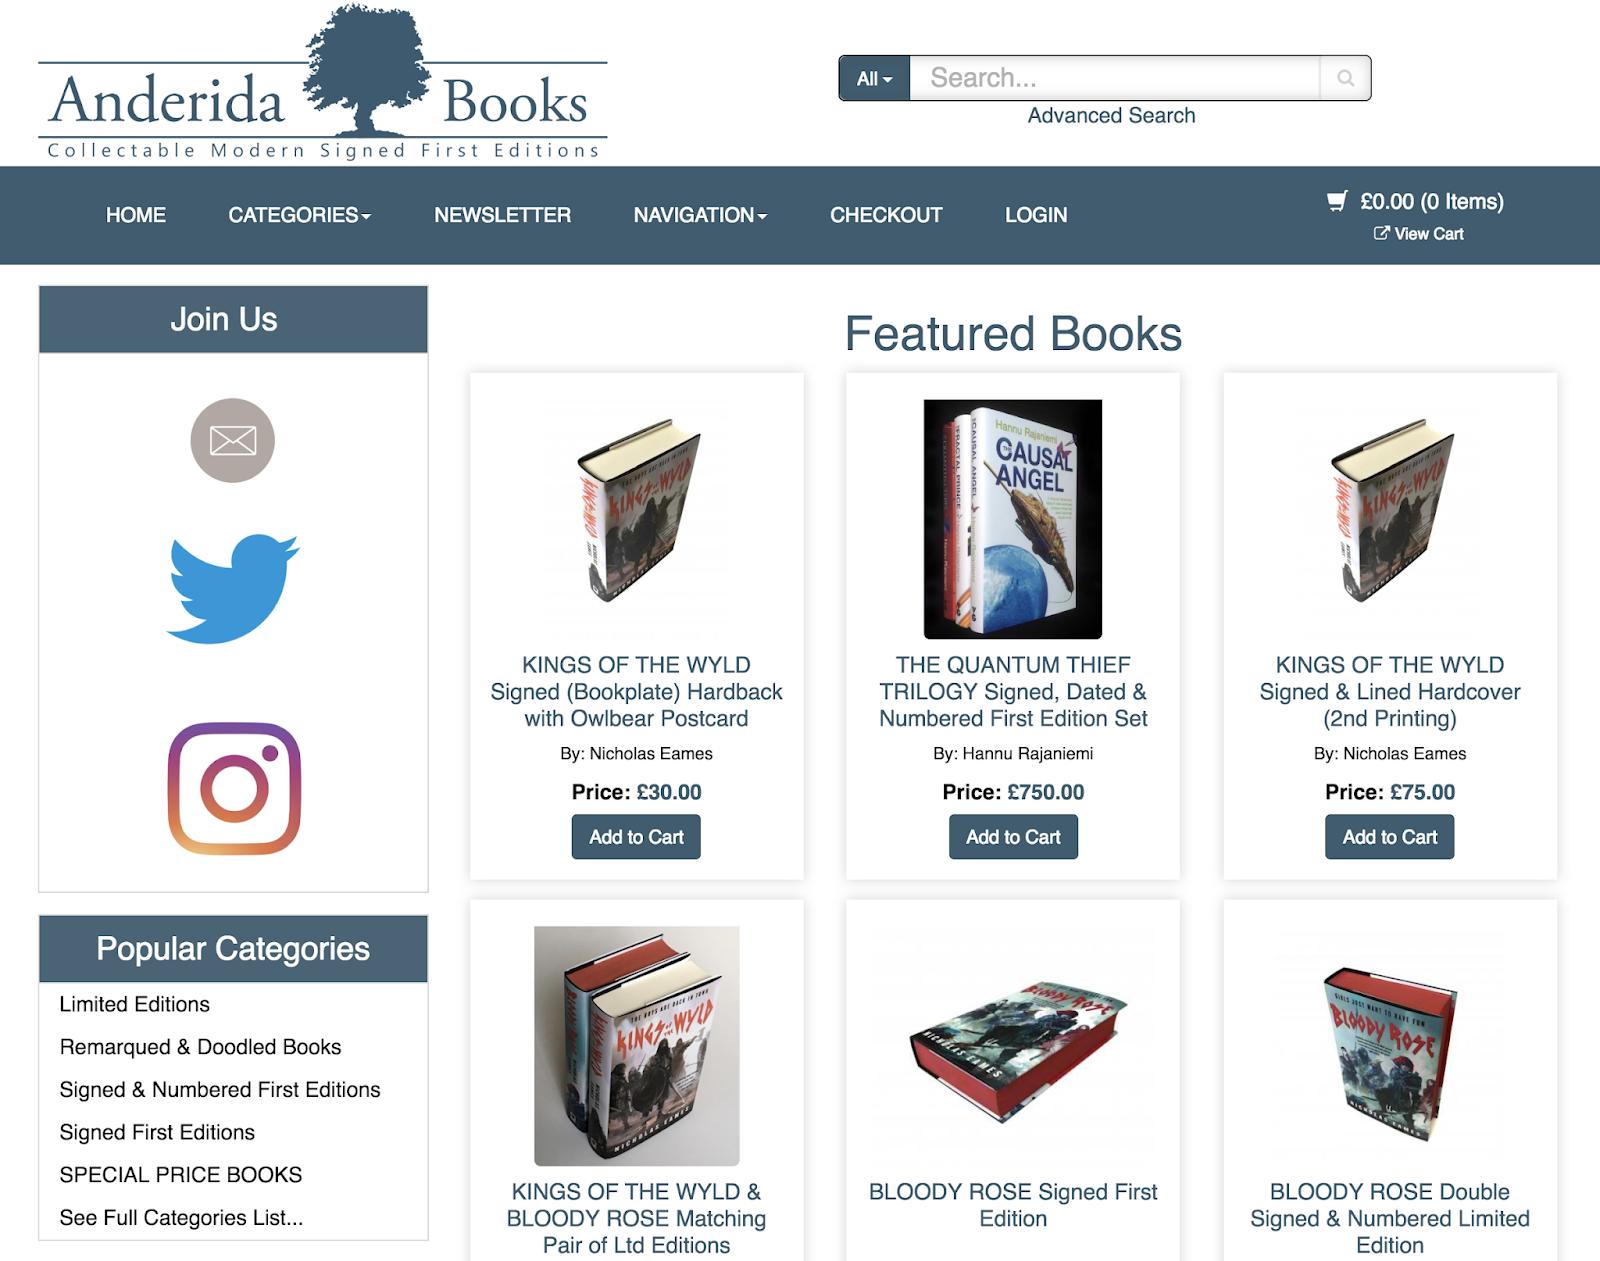 Anderida Books